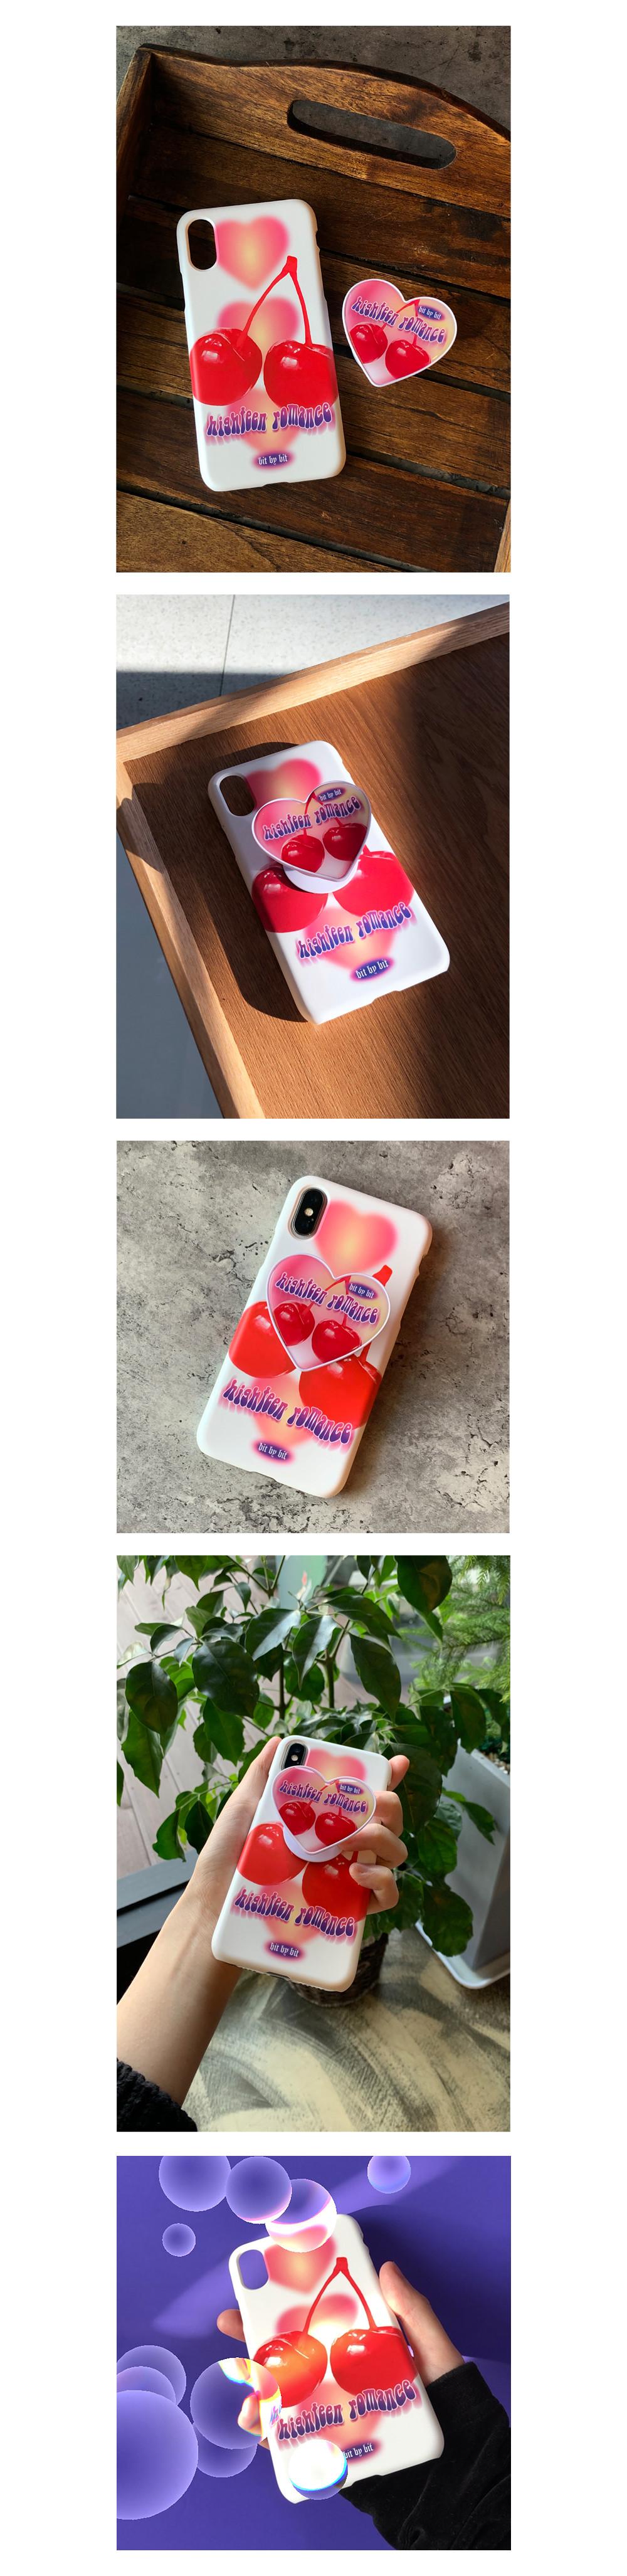 Big Cherry Phone Case